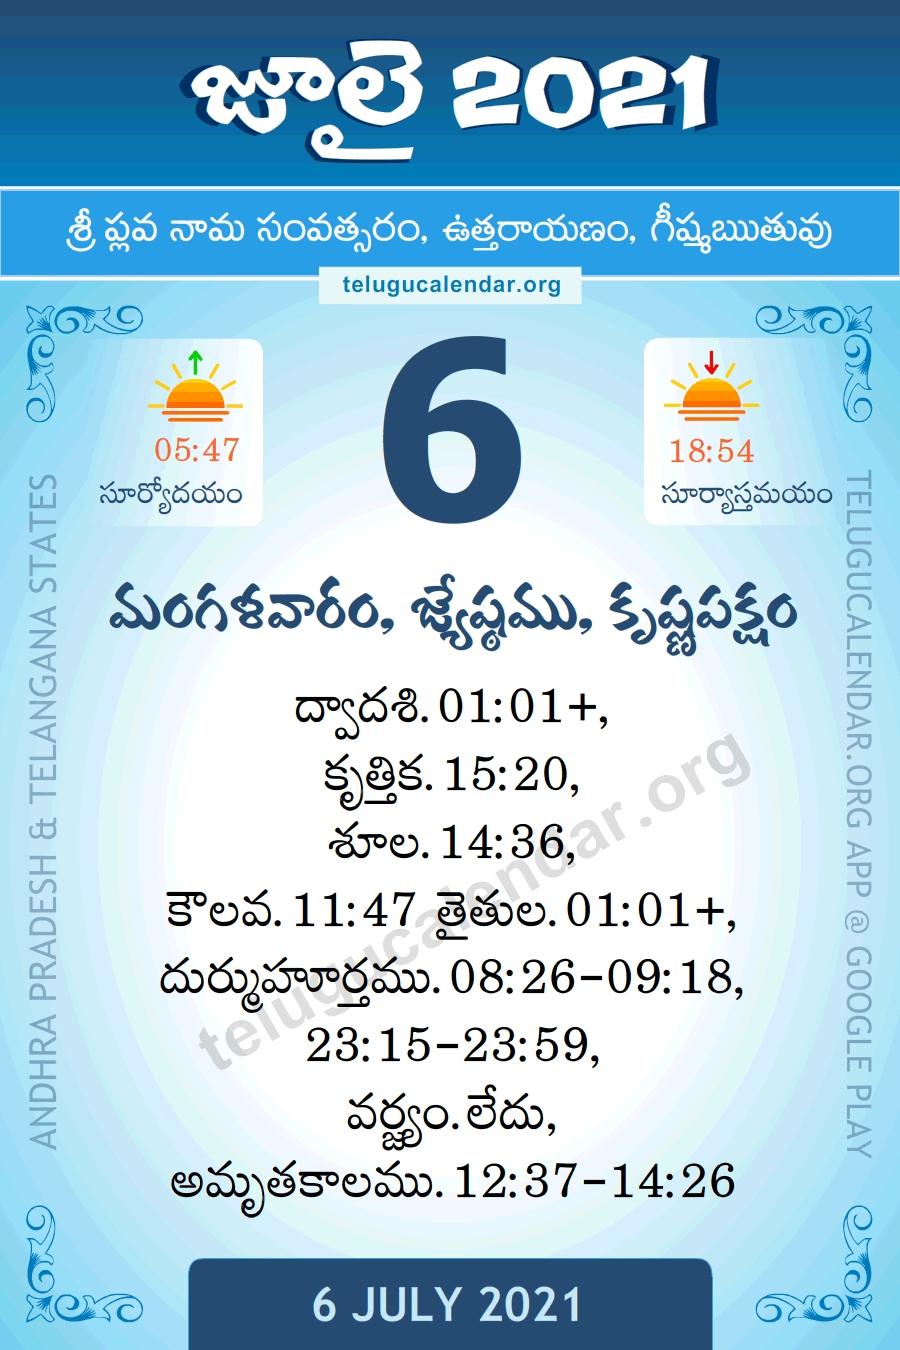 6 July 2021 Panchangam Calendar Daily In Telugu inside Telugu Calendar 2021 Panchangam